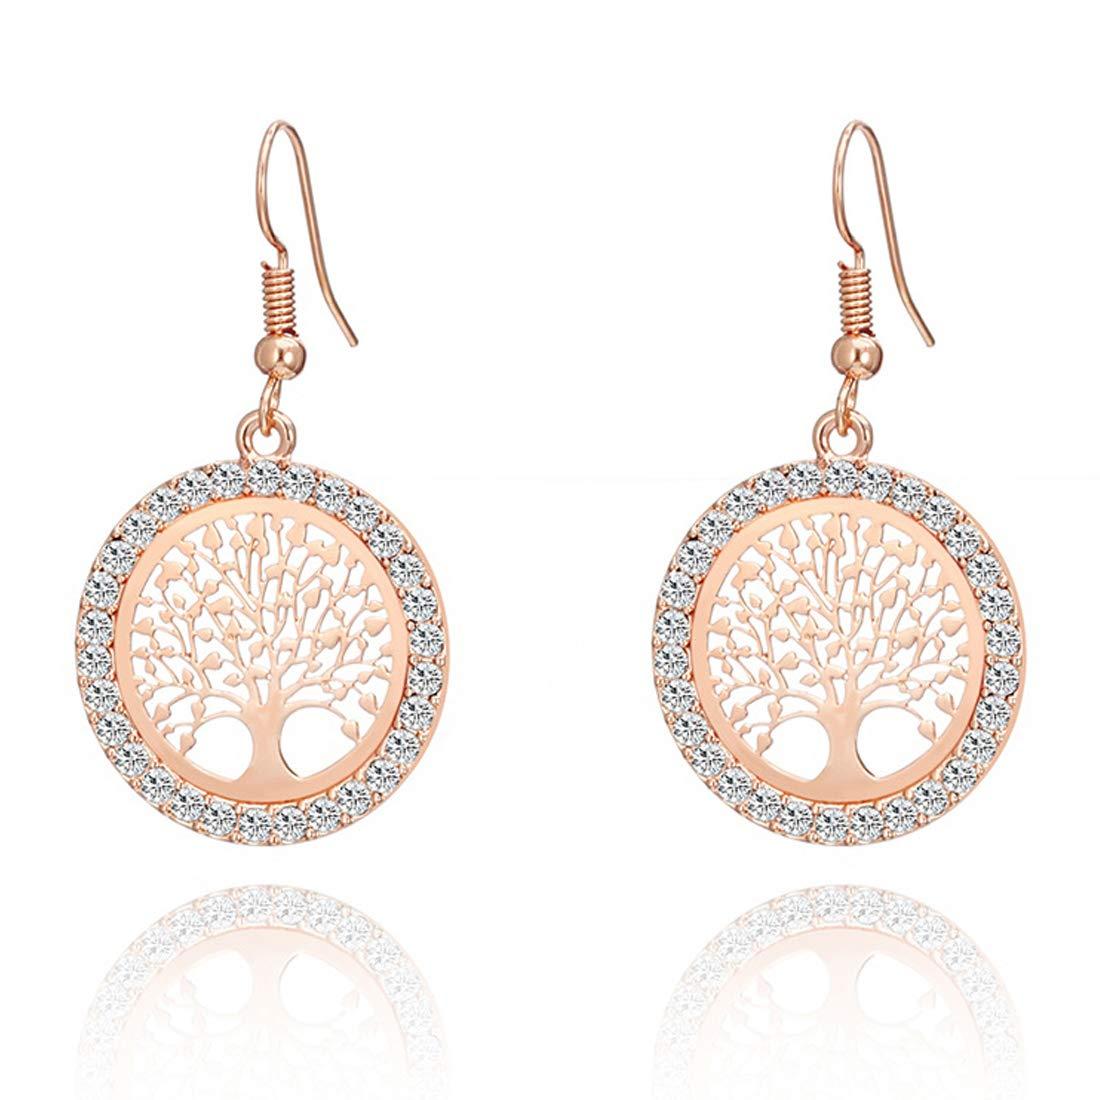 Fashion Tree Cubic Zirconia Earrings Round Drop Dangle Earrings for Women Girls